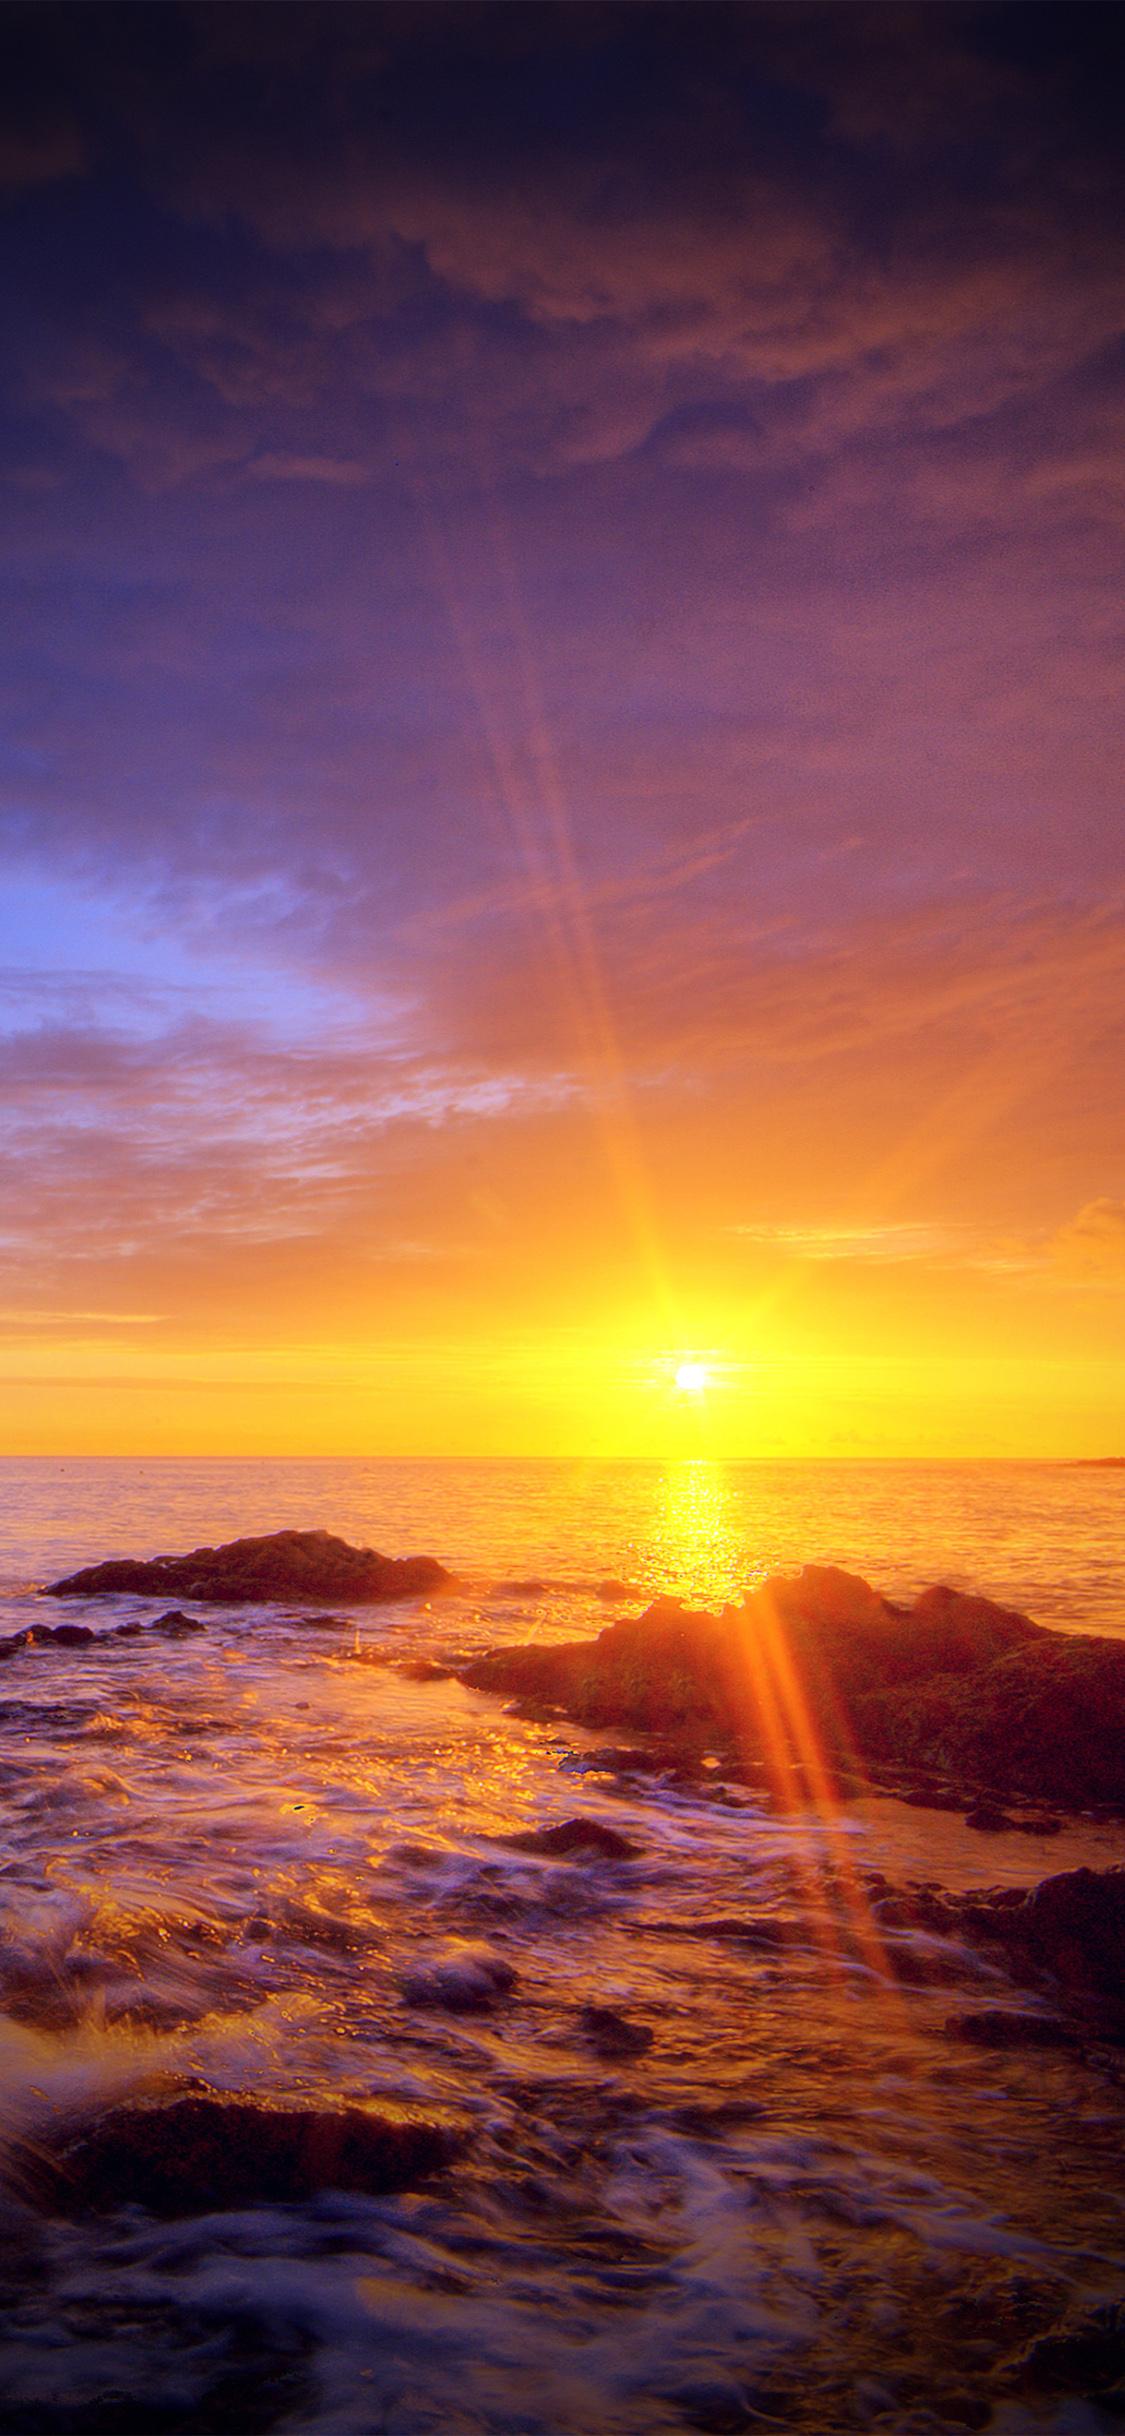 iPhoneXpapers.com-Apple-iPhone-wallpaper-mr41-sunshine-evening-sunset-beach-rock-nature-vignette